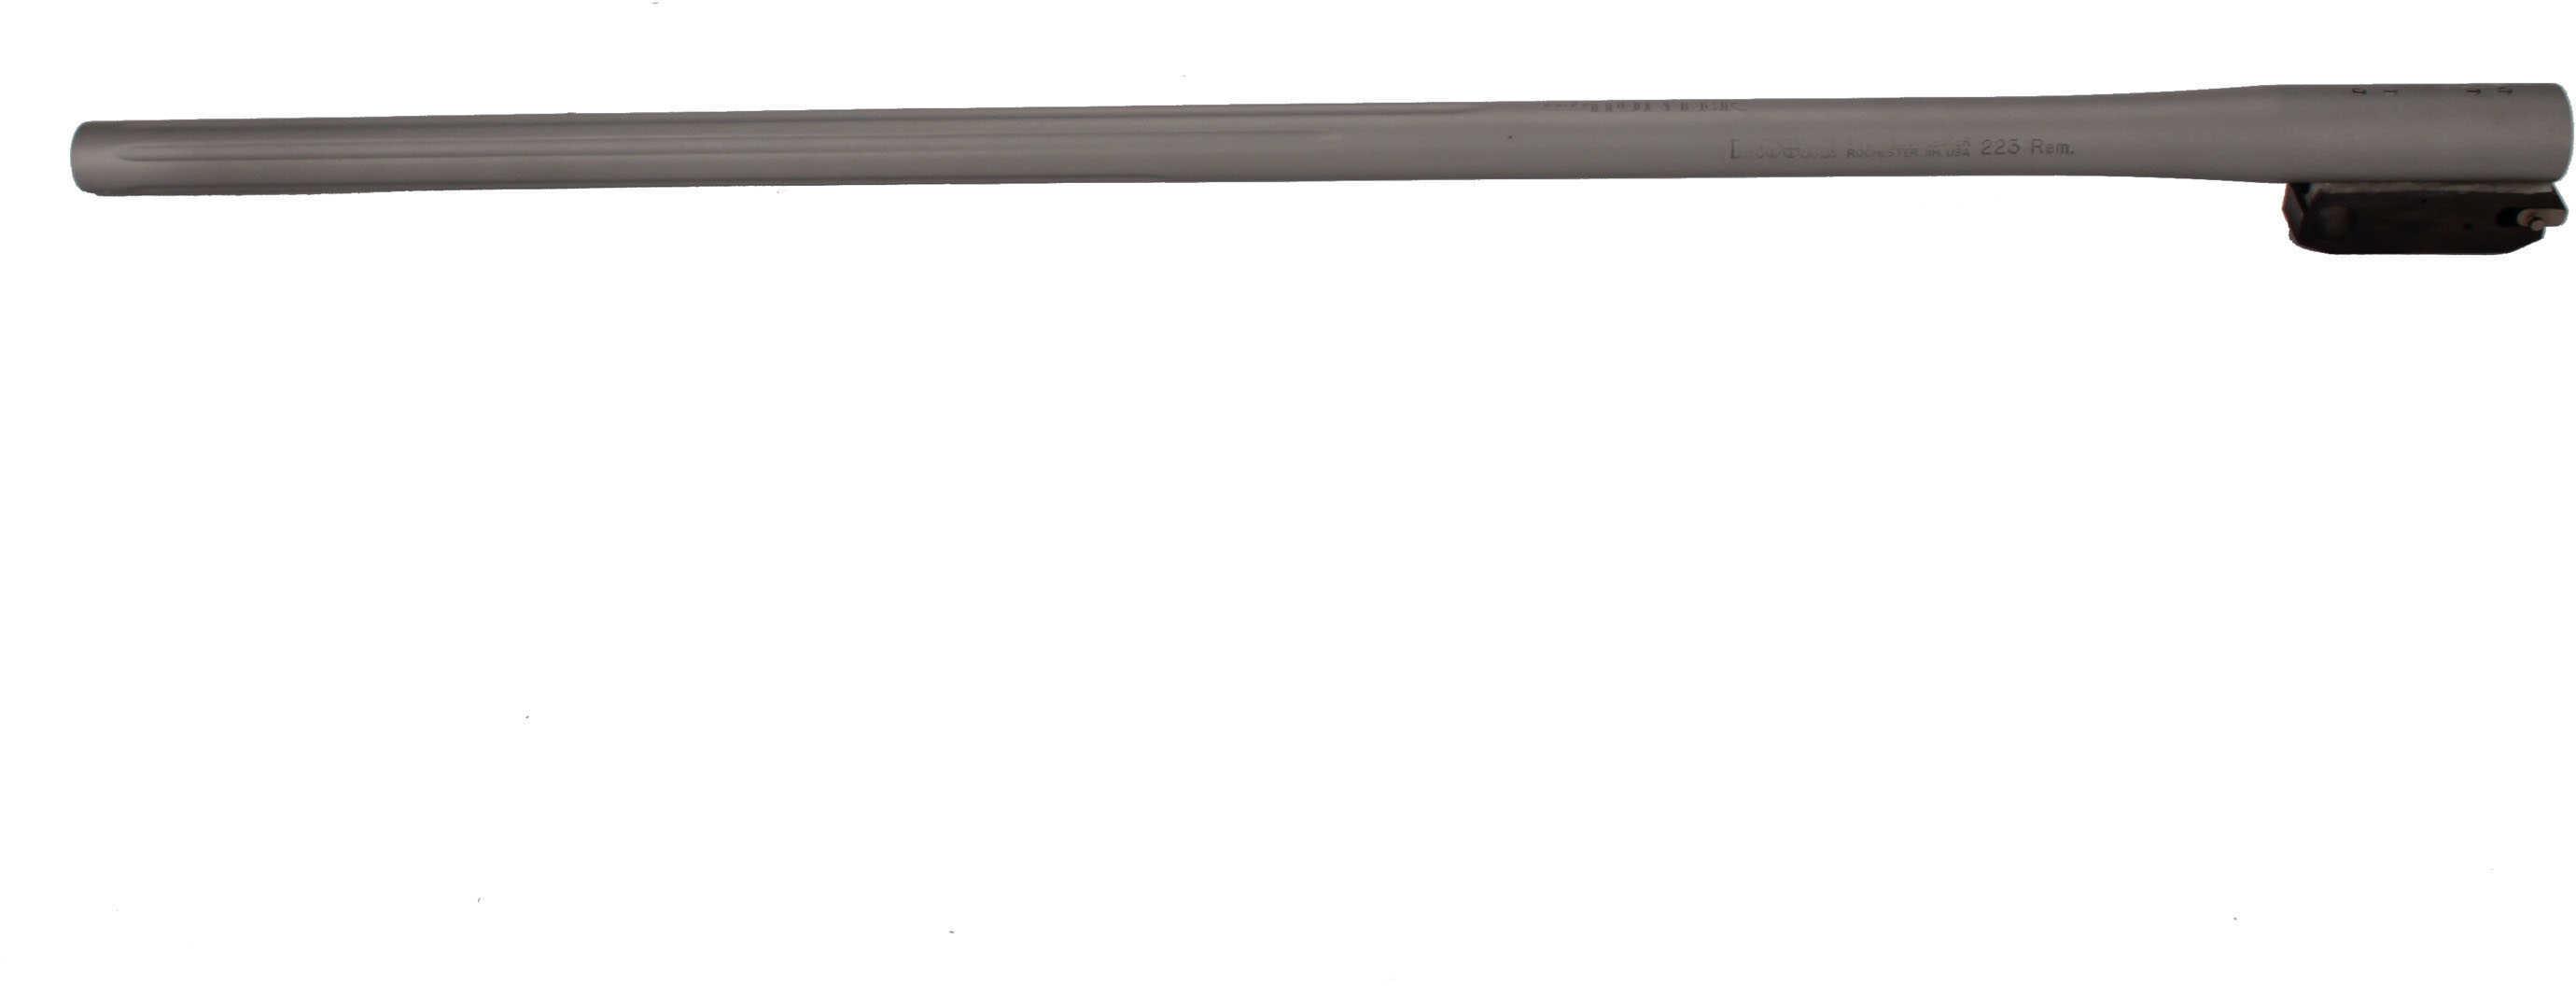 "Prohunter Barrel Weather Shield 26"" Fluted 223 Remington Md: 4748"